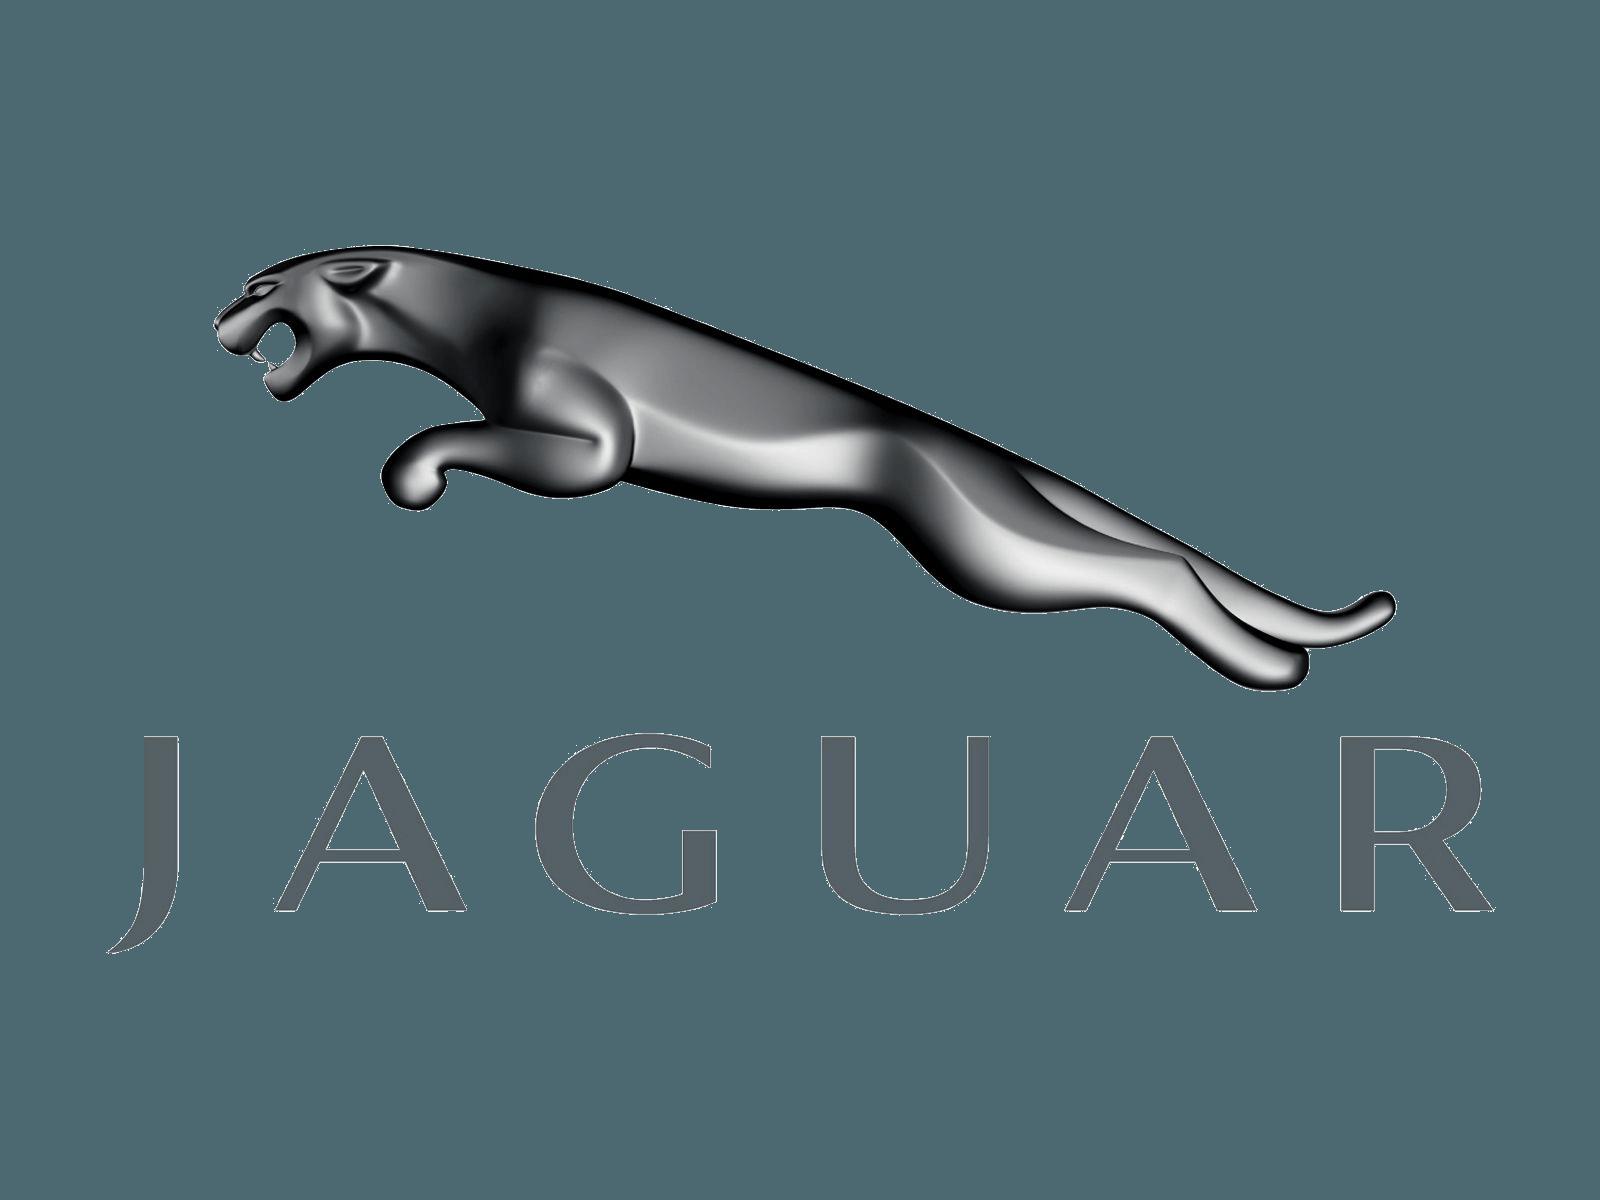 Jaguar Car Logo Png Brand Image Png Image - Car, Transparent background PNG HD thumbnail